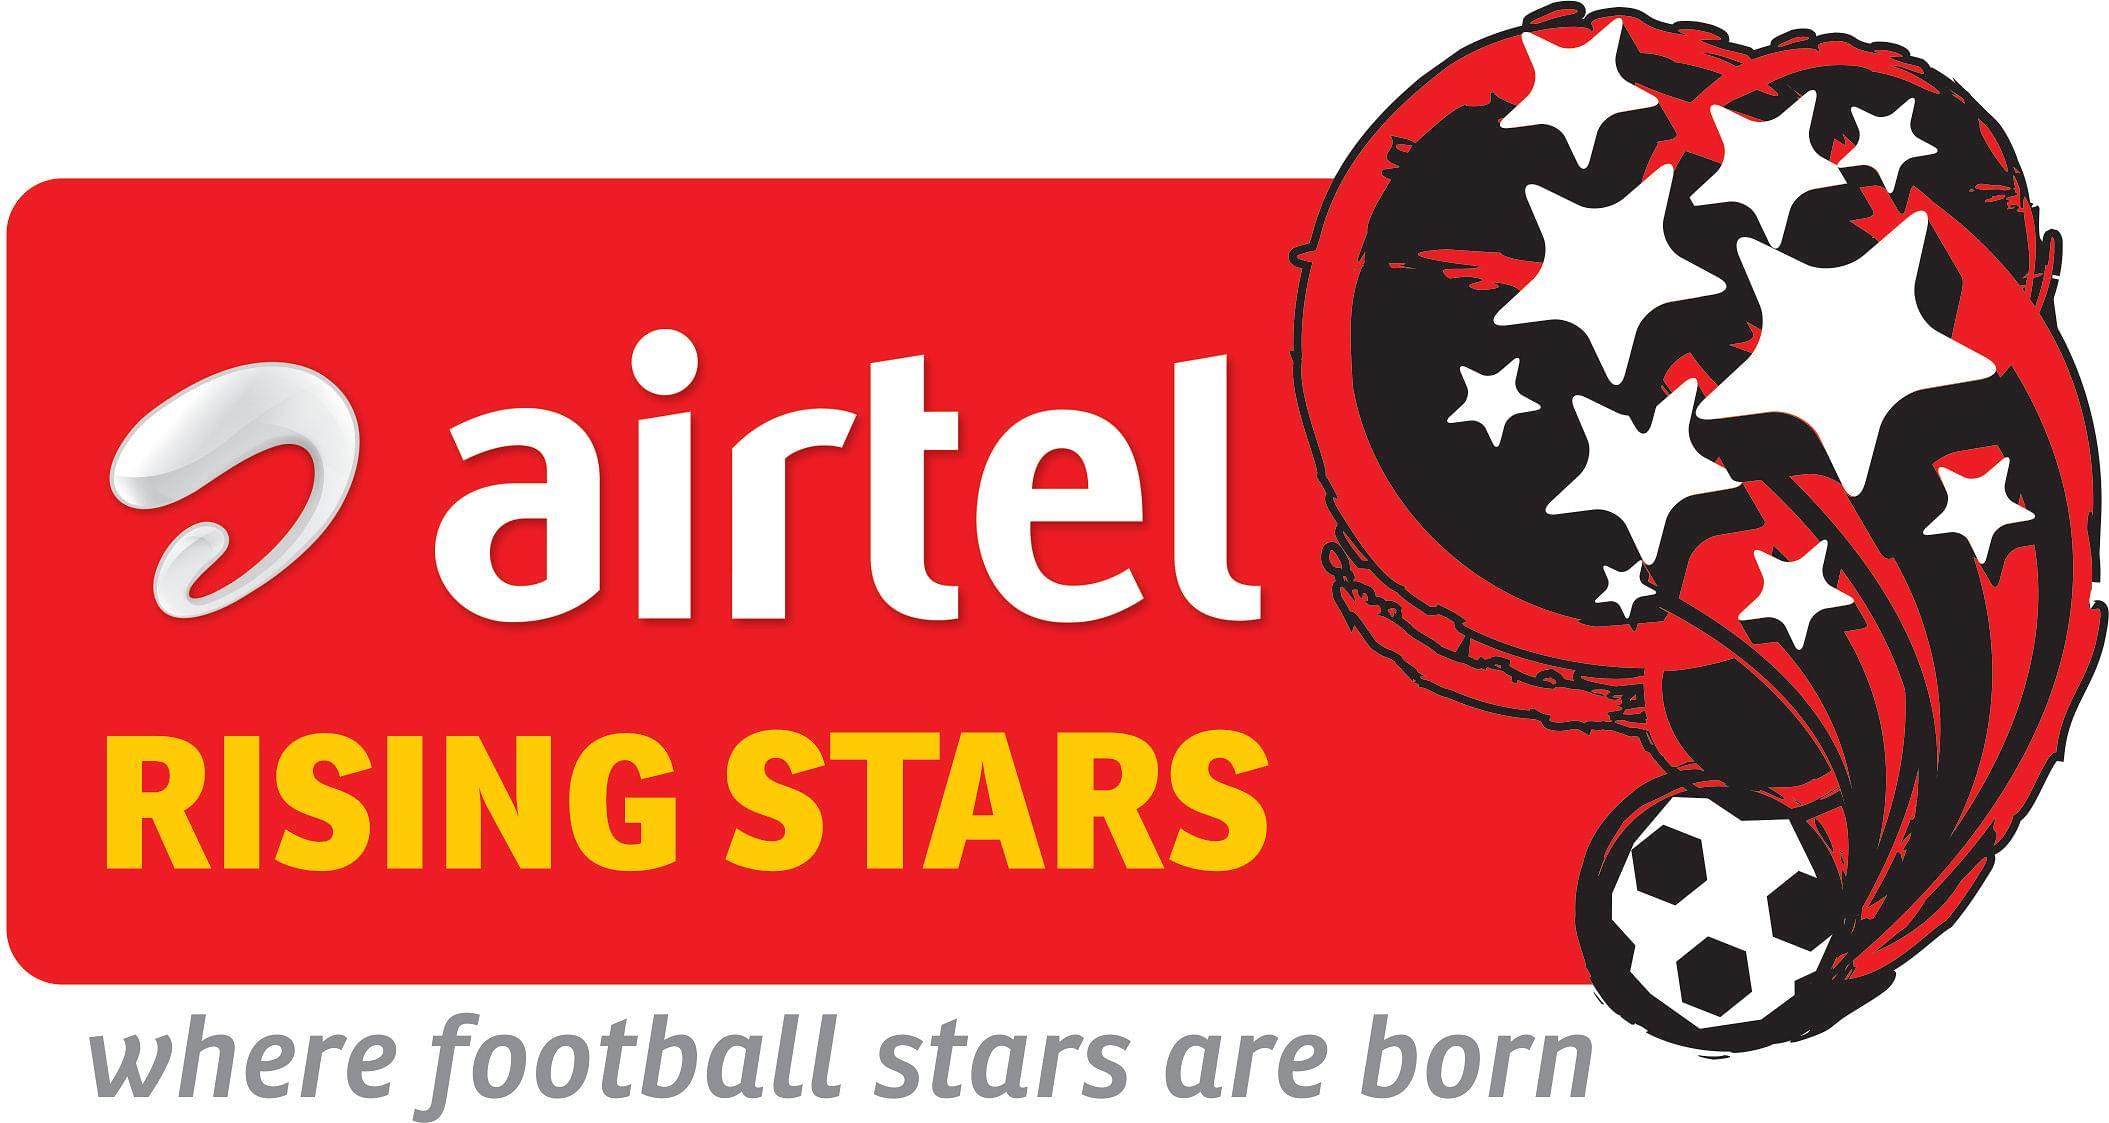 http://static.sportskeeda.com/wp-content/uploads/2014/05/ars-logo-1866385-2184652.jpg